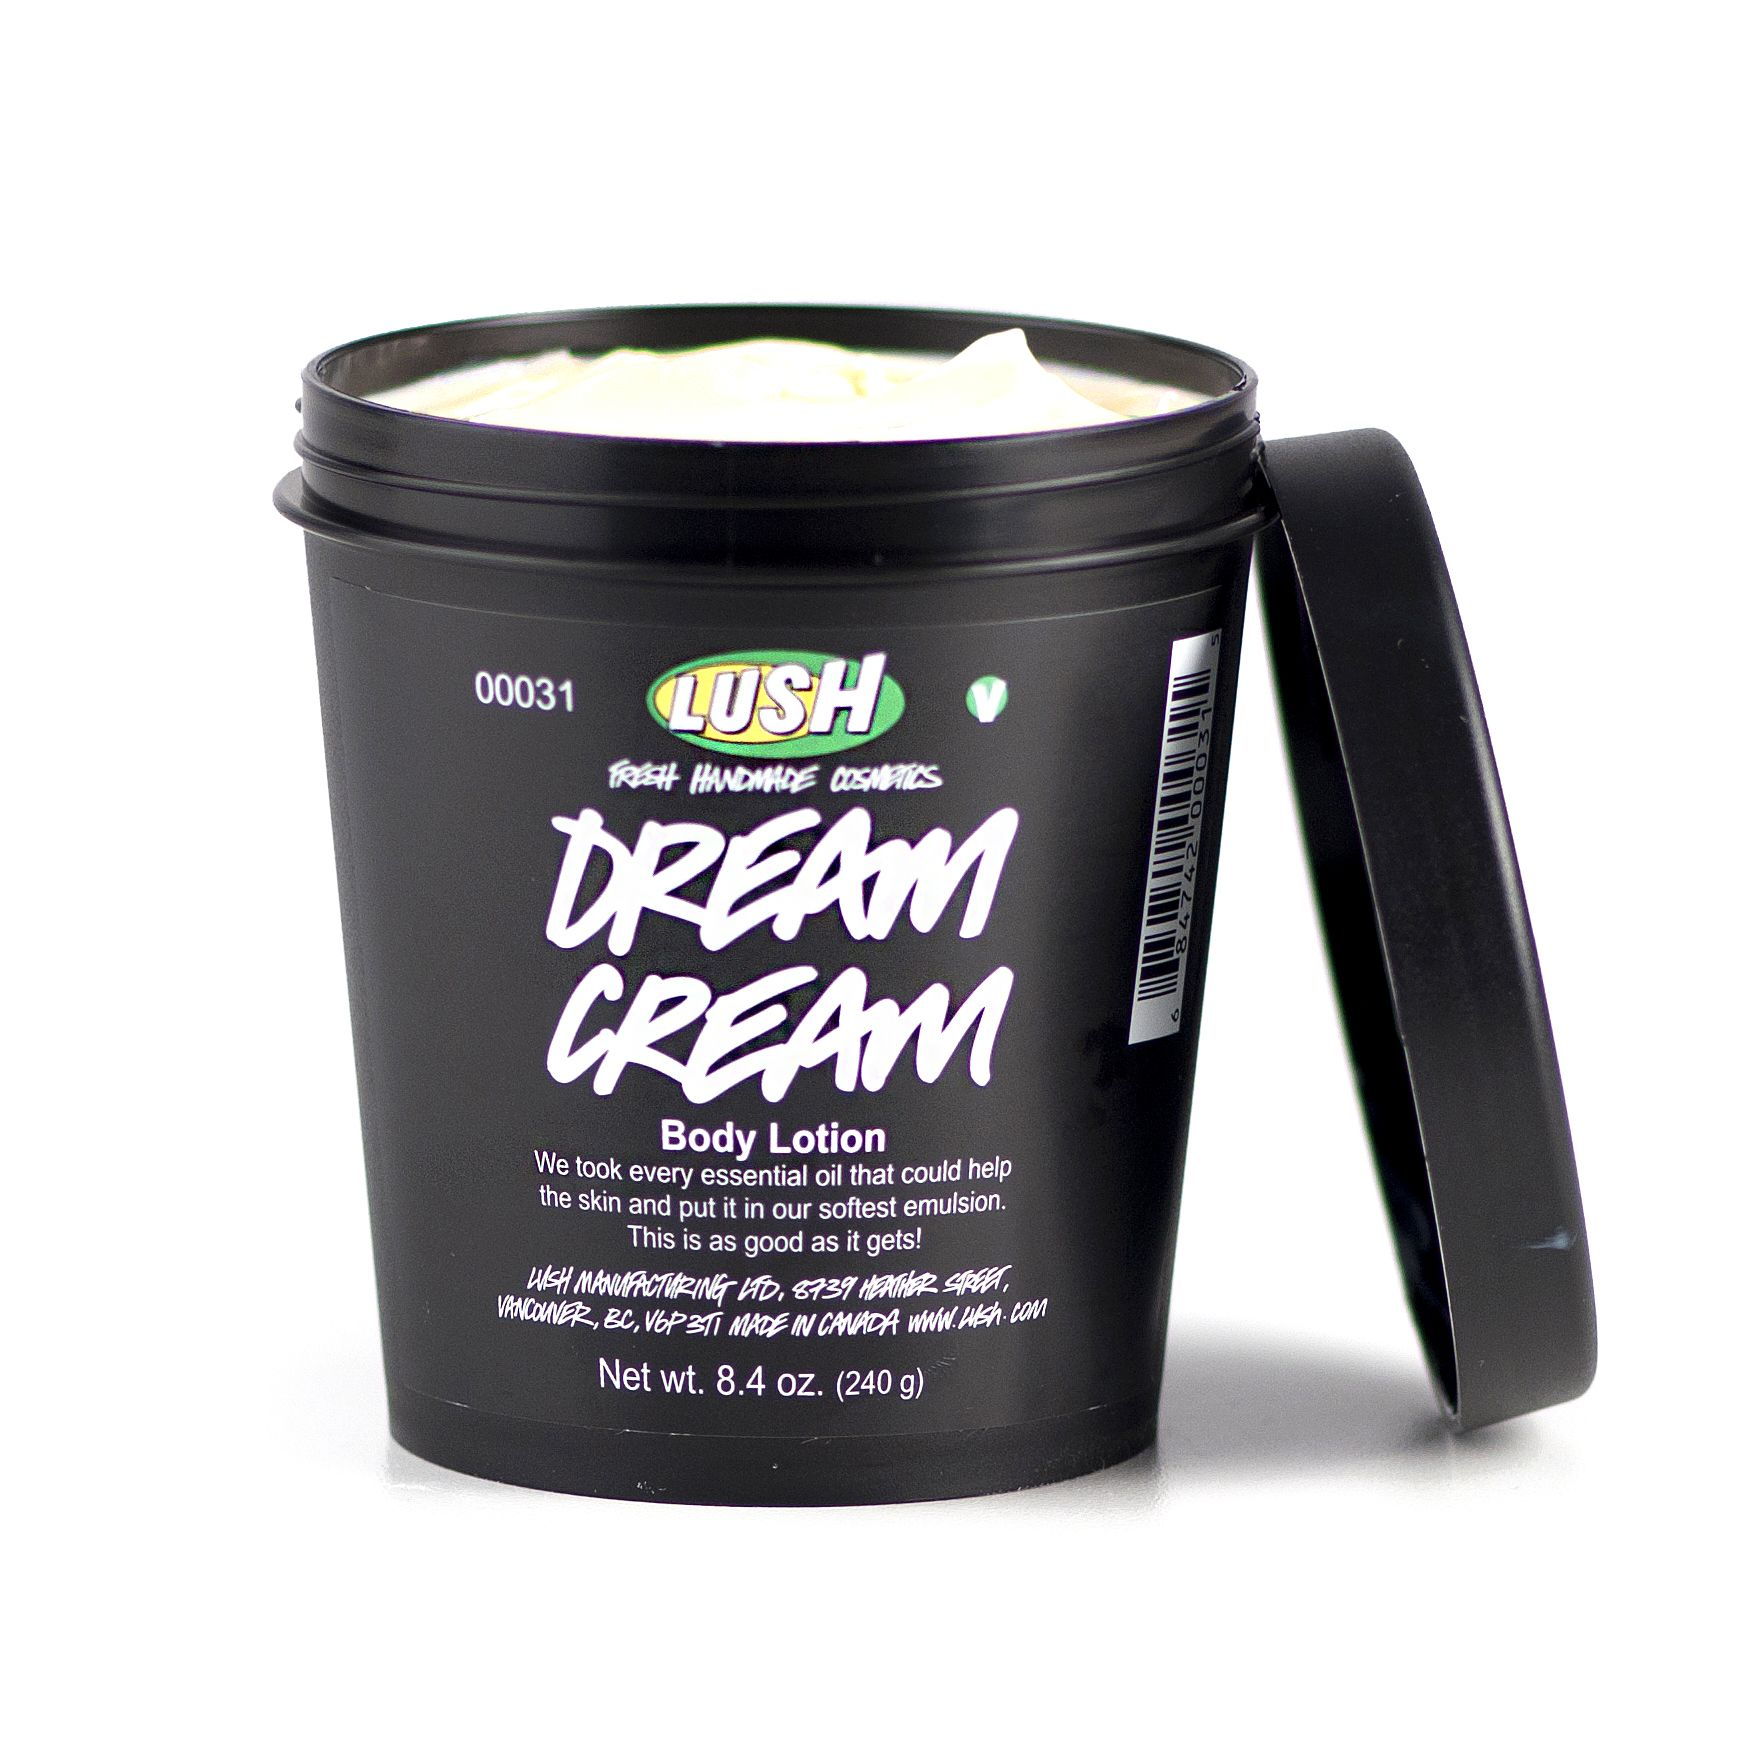 Dream Cream Lush Dream Cream Body Cream Lush Cosmetics